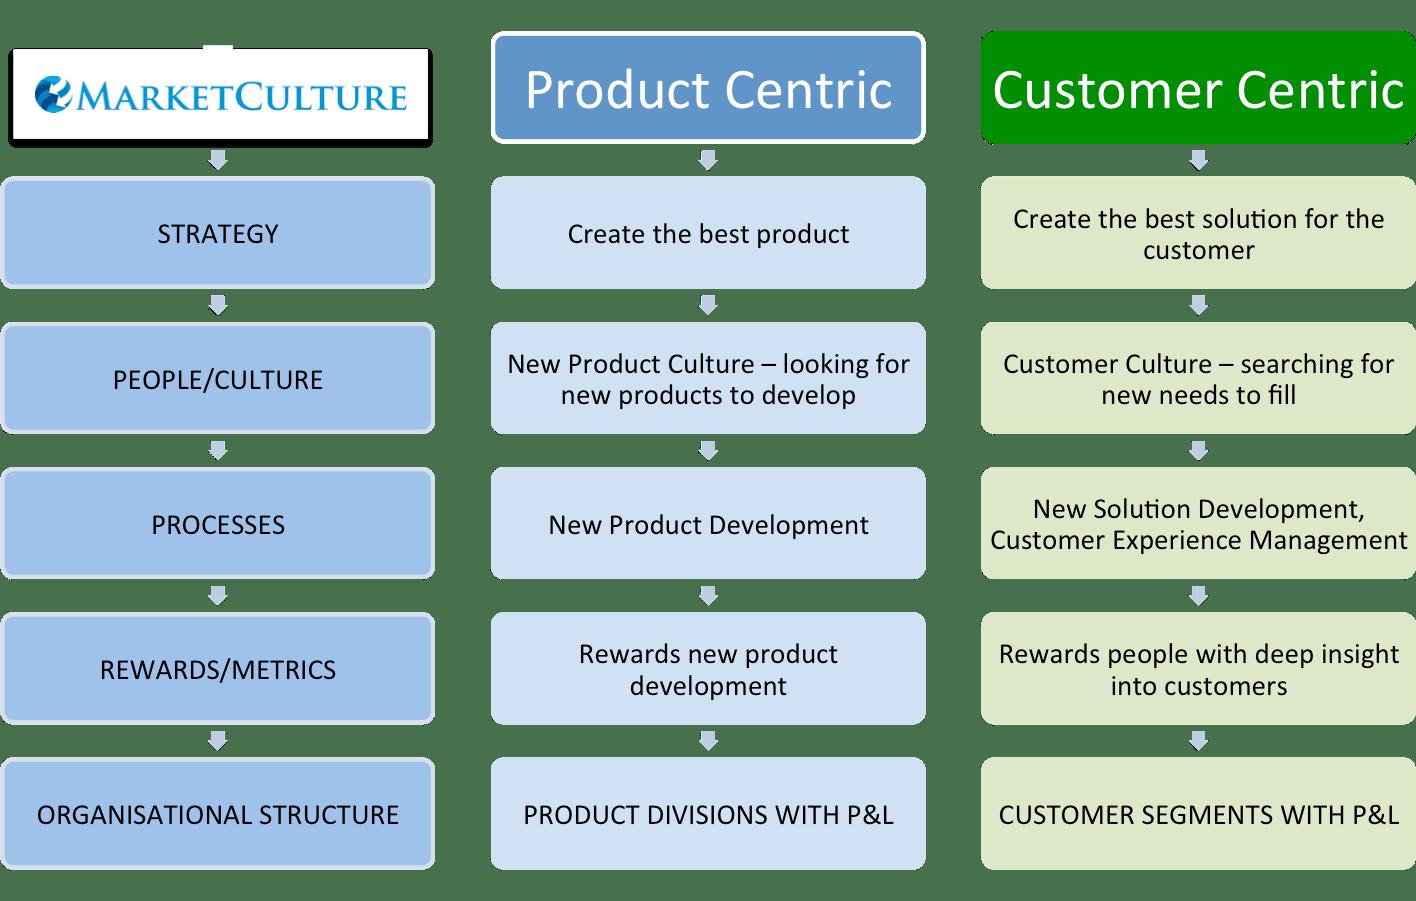 Product Centric Versus Customer Centric; Internal Focus